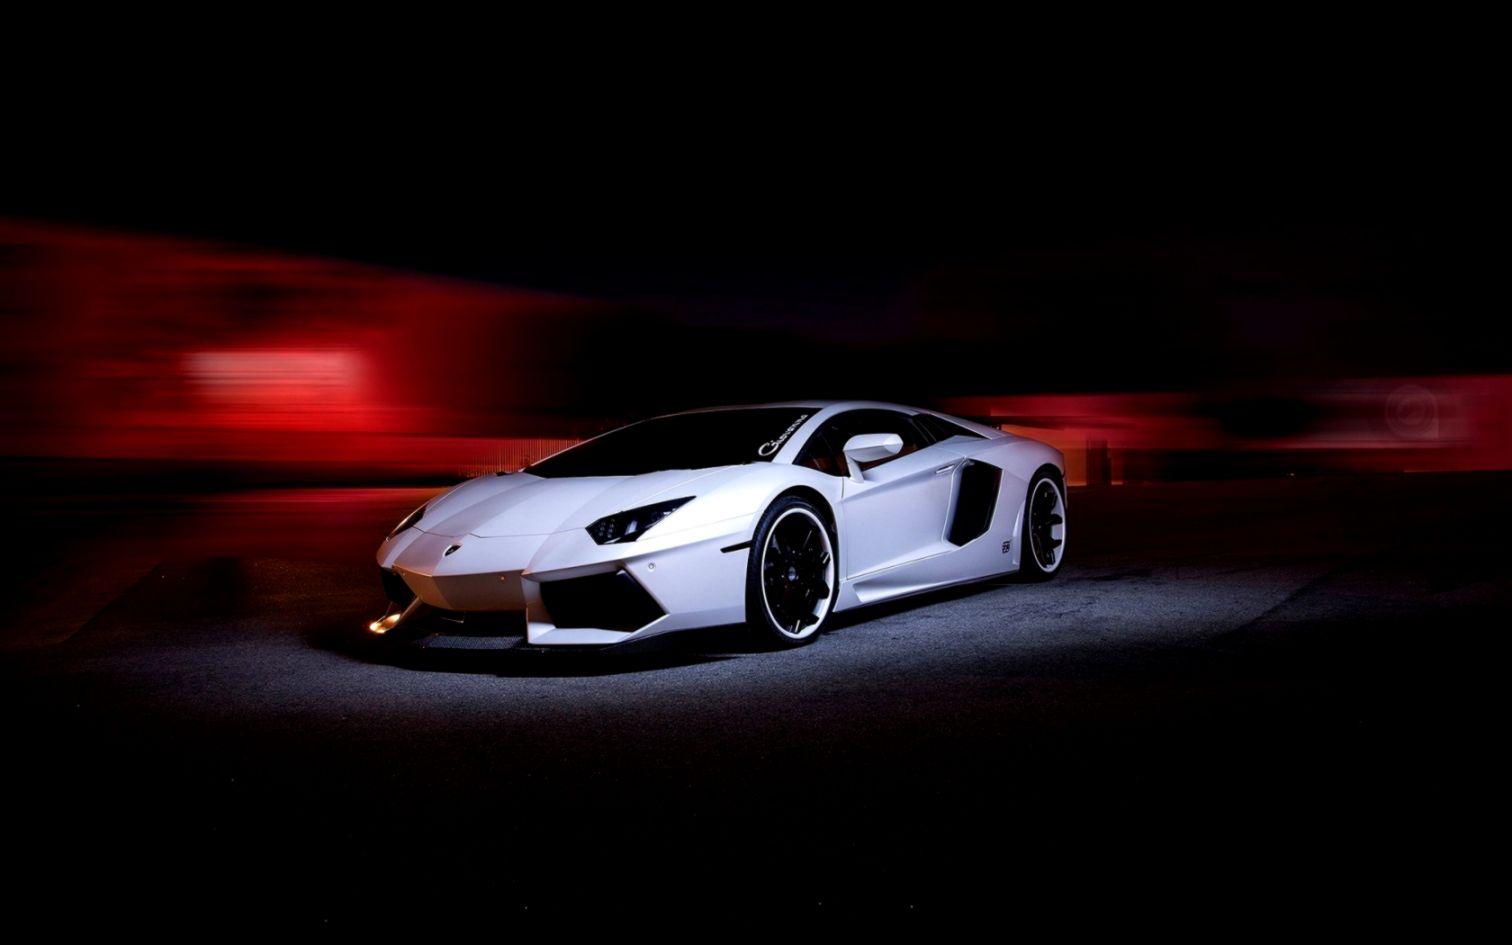 Lamborghini Aventador Lp700 4 Night Hd Wallpaper  Best Desktop